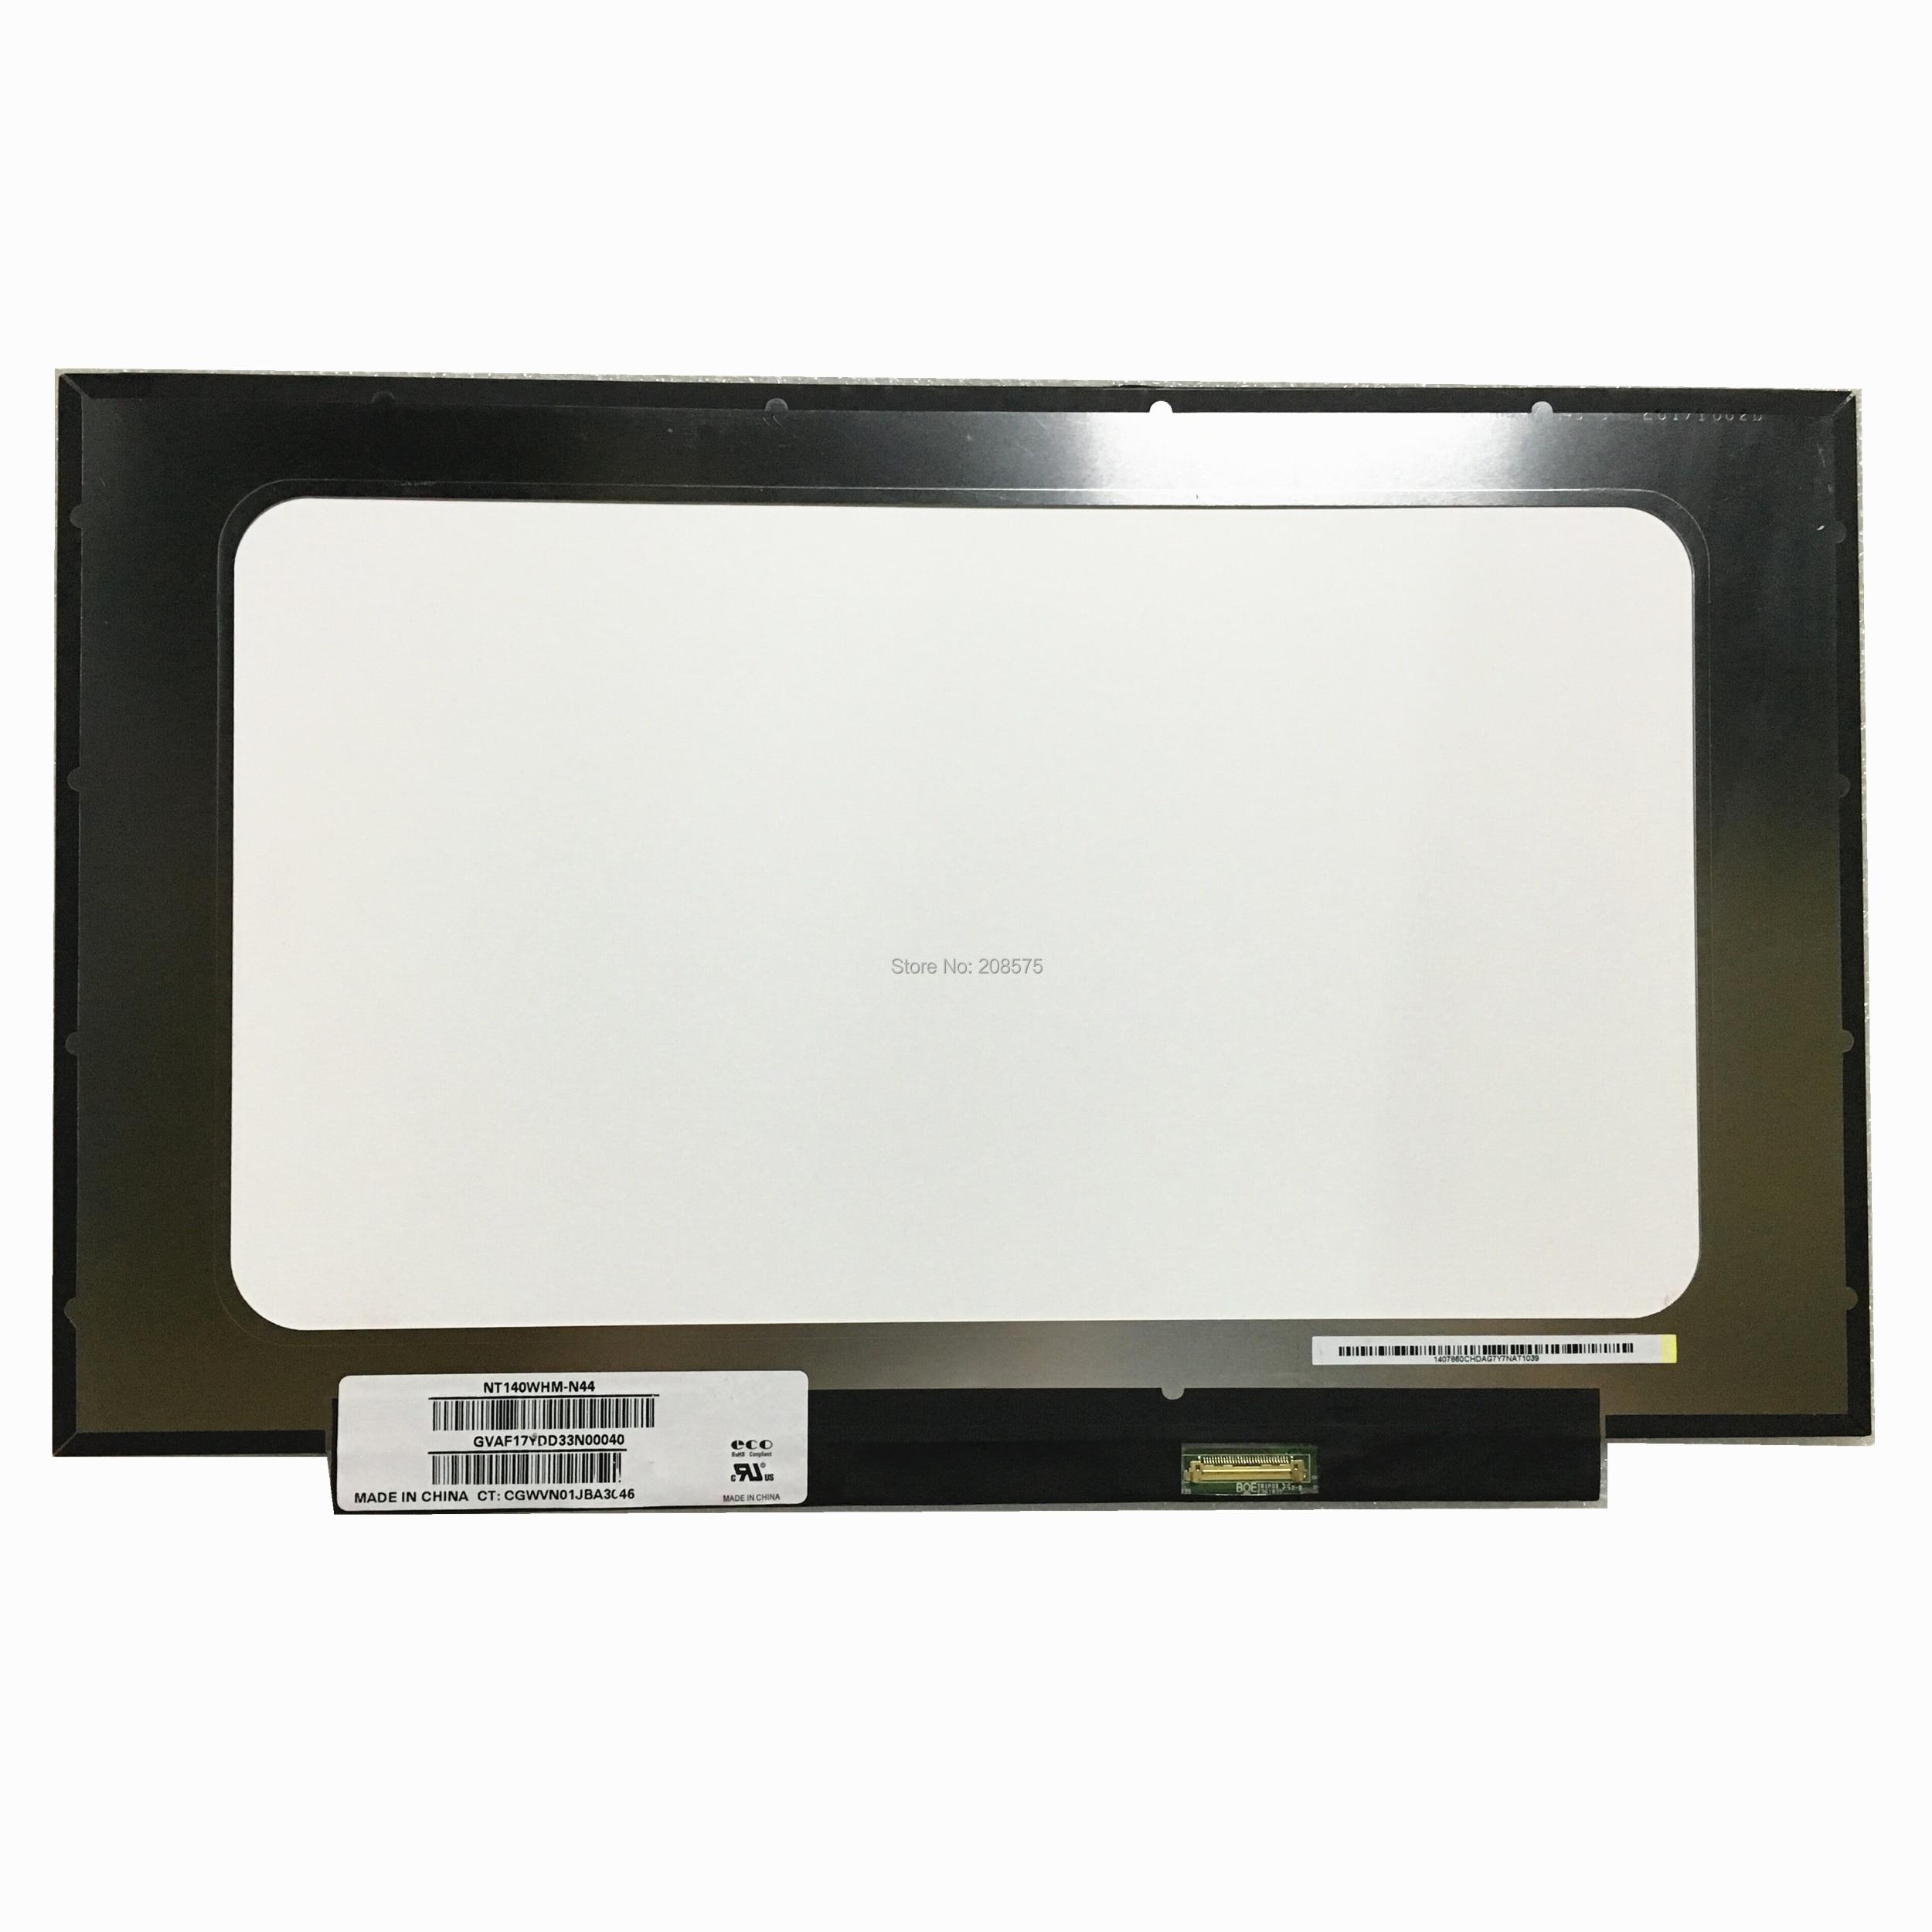 Freeing shipping NT140WHM-N44 NT140WHM N44 NT140WHM-N43 For HP 14-cf0006nx Laptop Lcd Screen 1366*768 EDP 30 pinsFreeing shipping NT140WHM-N44 NT140WHM N44 NT140WHM-N43 For HP 14-cf0006nx Laptop Lcd Screen 1366*768 EDP 30 pins